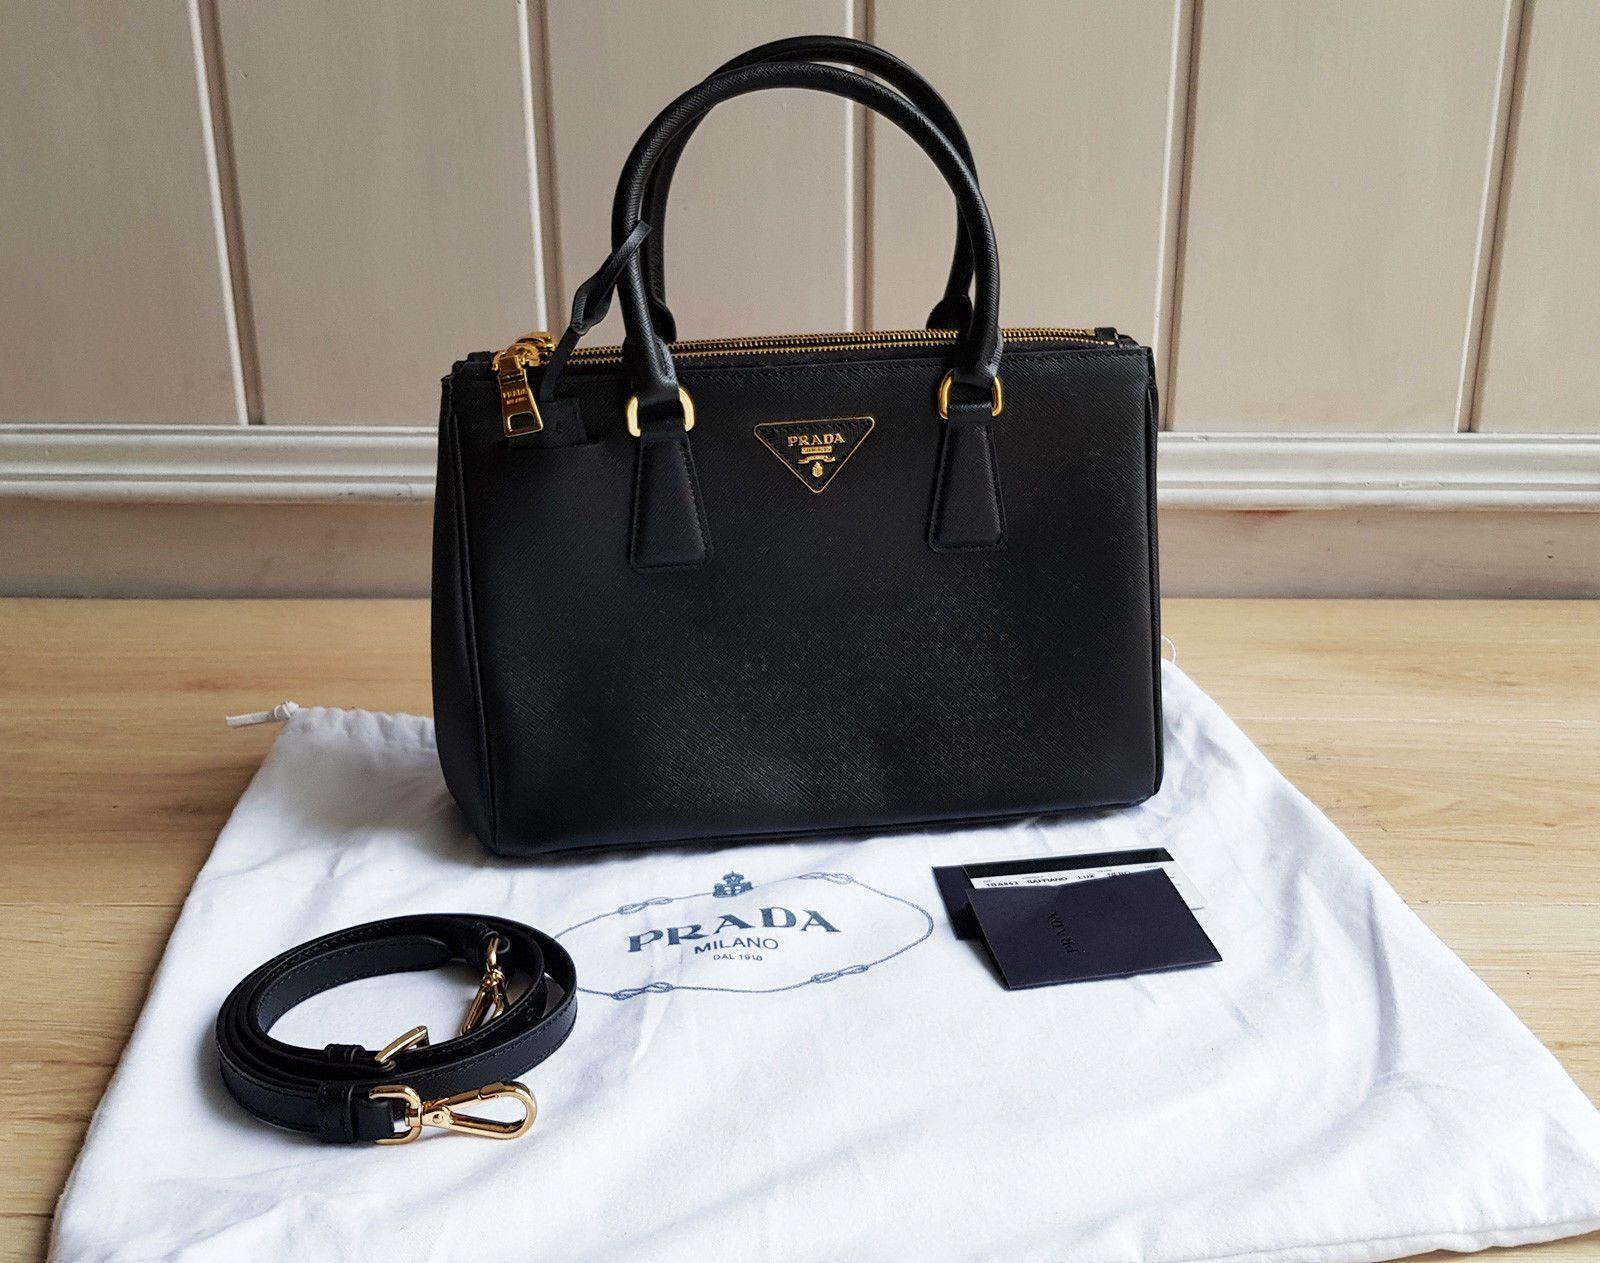 b67d539c Prada Saffiano Lux Double-Zip Tote Bag Nero Black 1BA863 Galleria ...